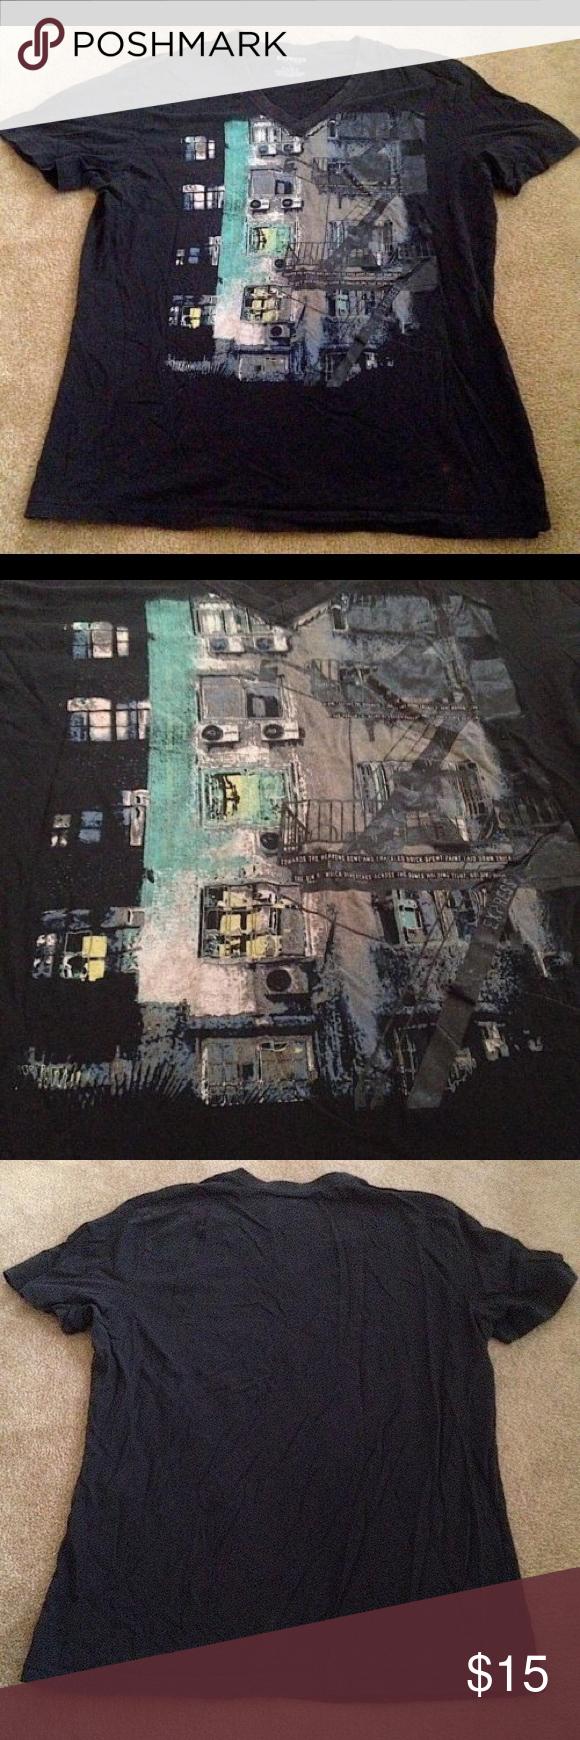 Black t shirt express - Black T Shirt Express 47